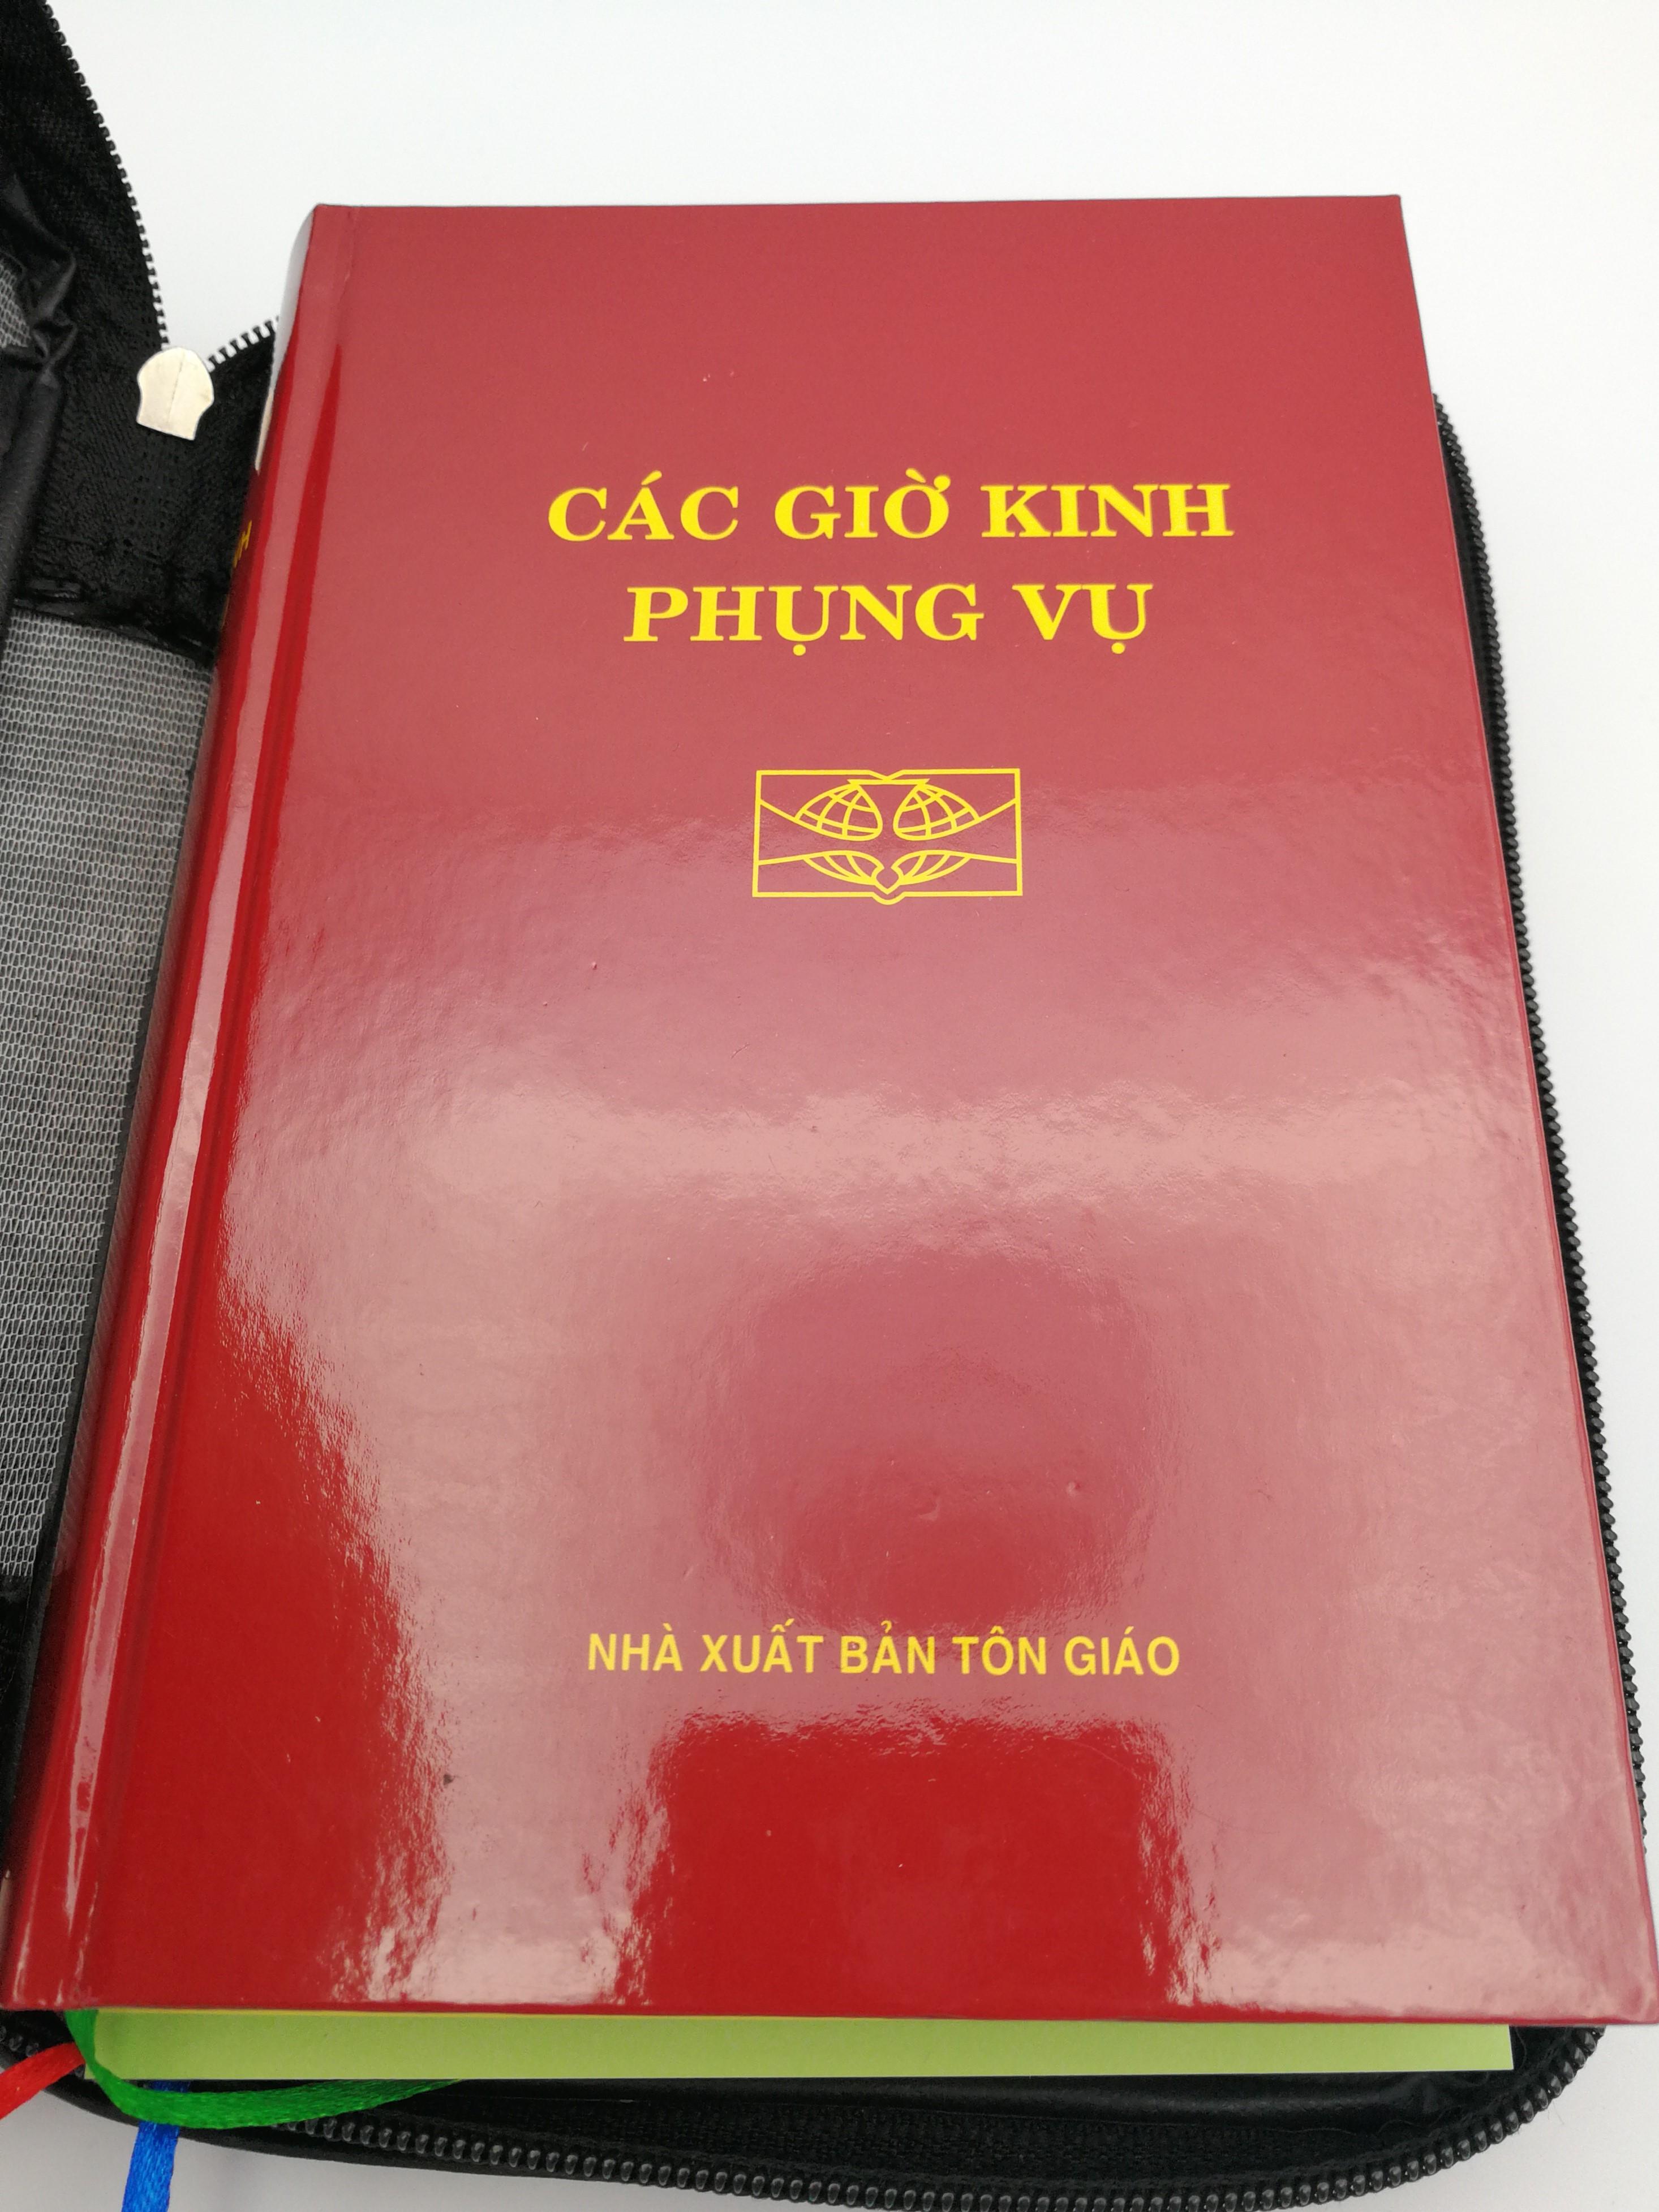 vietnamese-catholic-missal-book-order-of-liturgy-3.jpg